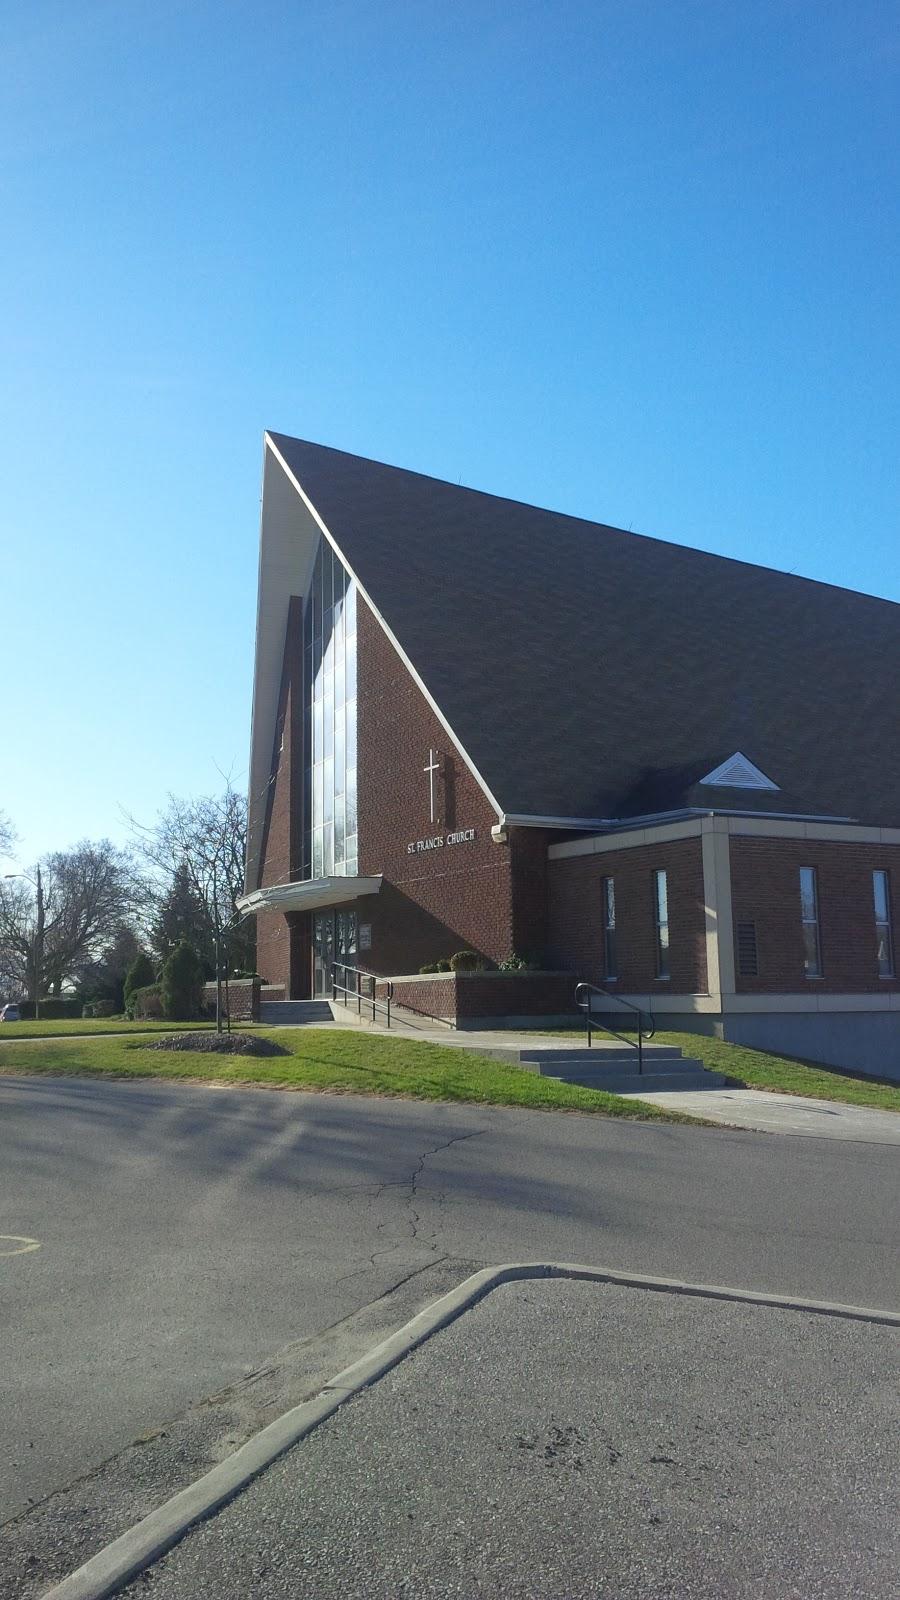 St Francis of Assisi Catholic Church | church | 49 Blueridge Ave, Kitchener, ON N2M 4E2, Canada | 5197457301 OR +1 519-745-7301